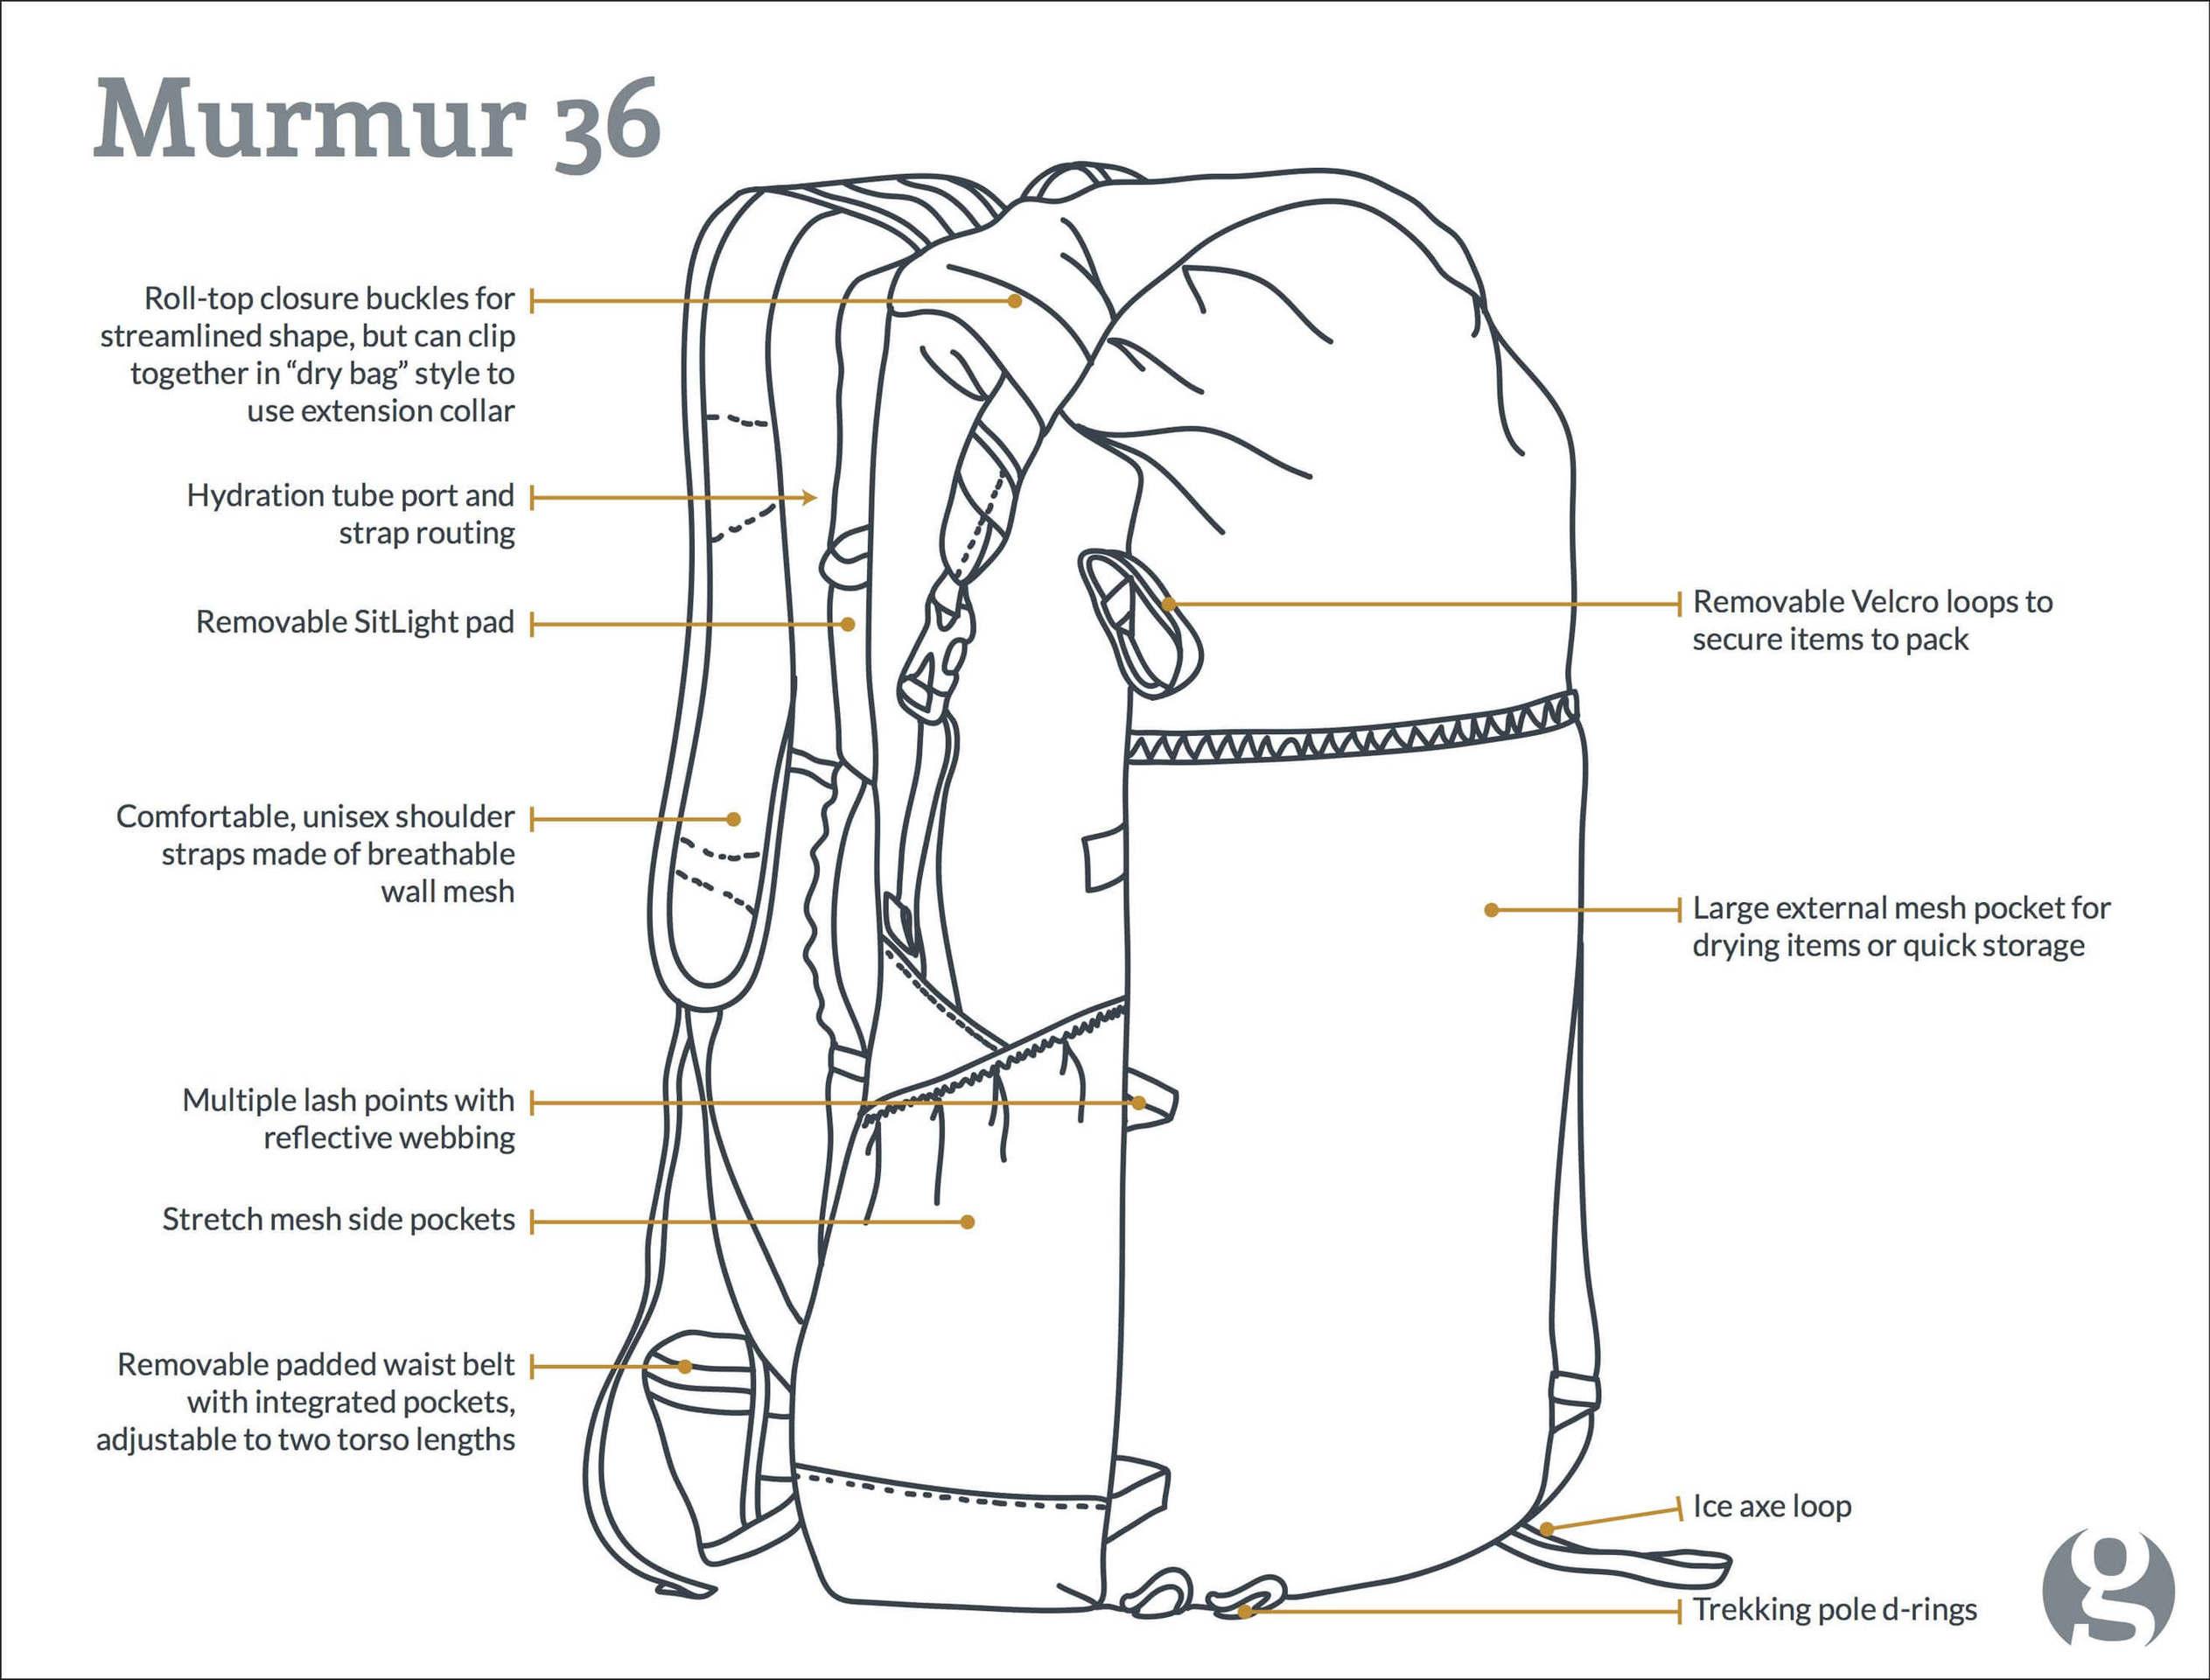 Gossamer Gear Murmur